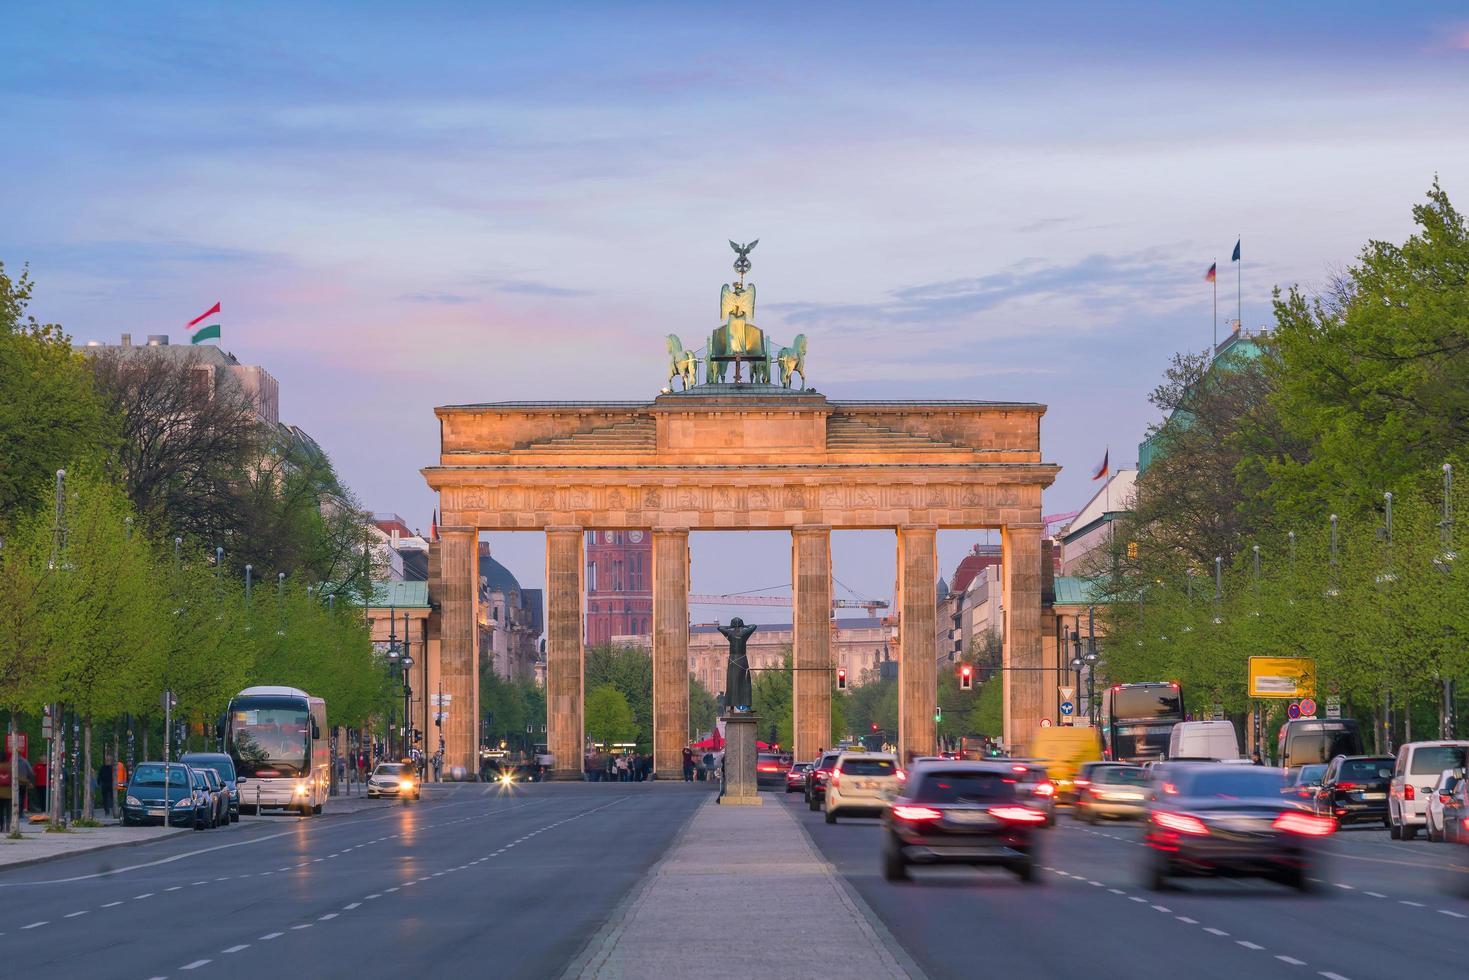 La porte de Brandebourg à berlin photo